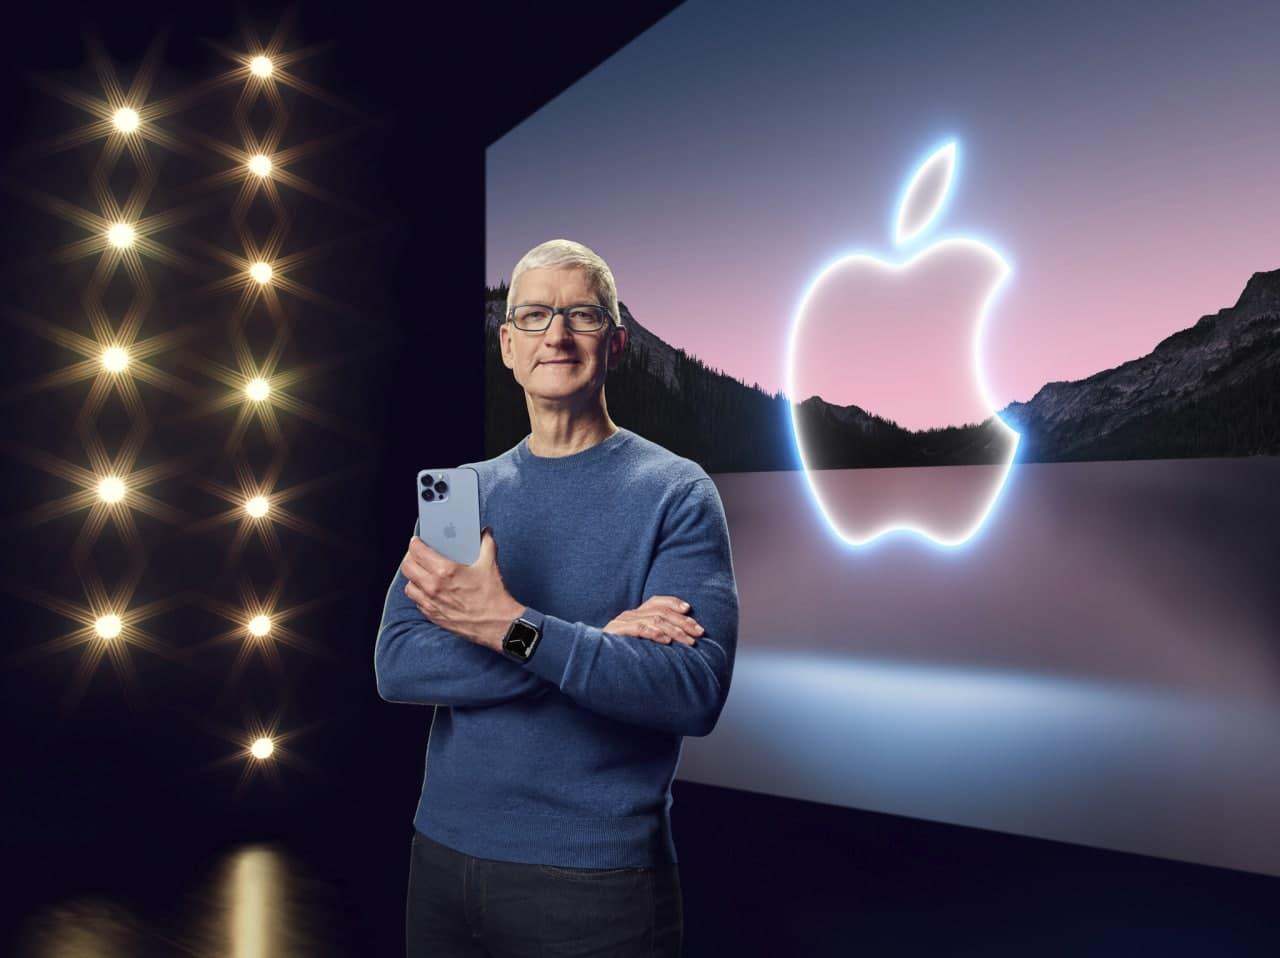 Apple показала iPhone 13 Pro и iPhone 13 Pro Max официально (photo 2021 09 14 21 37 12)